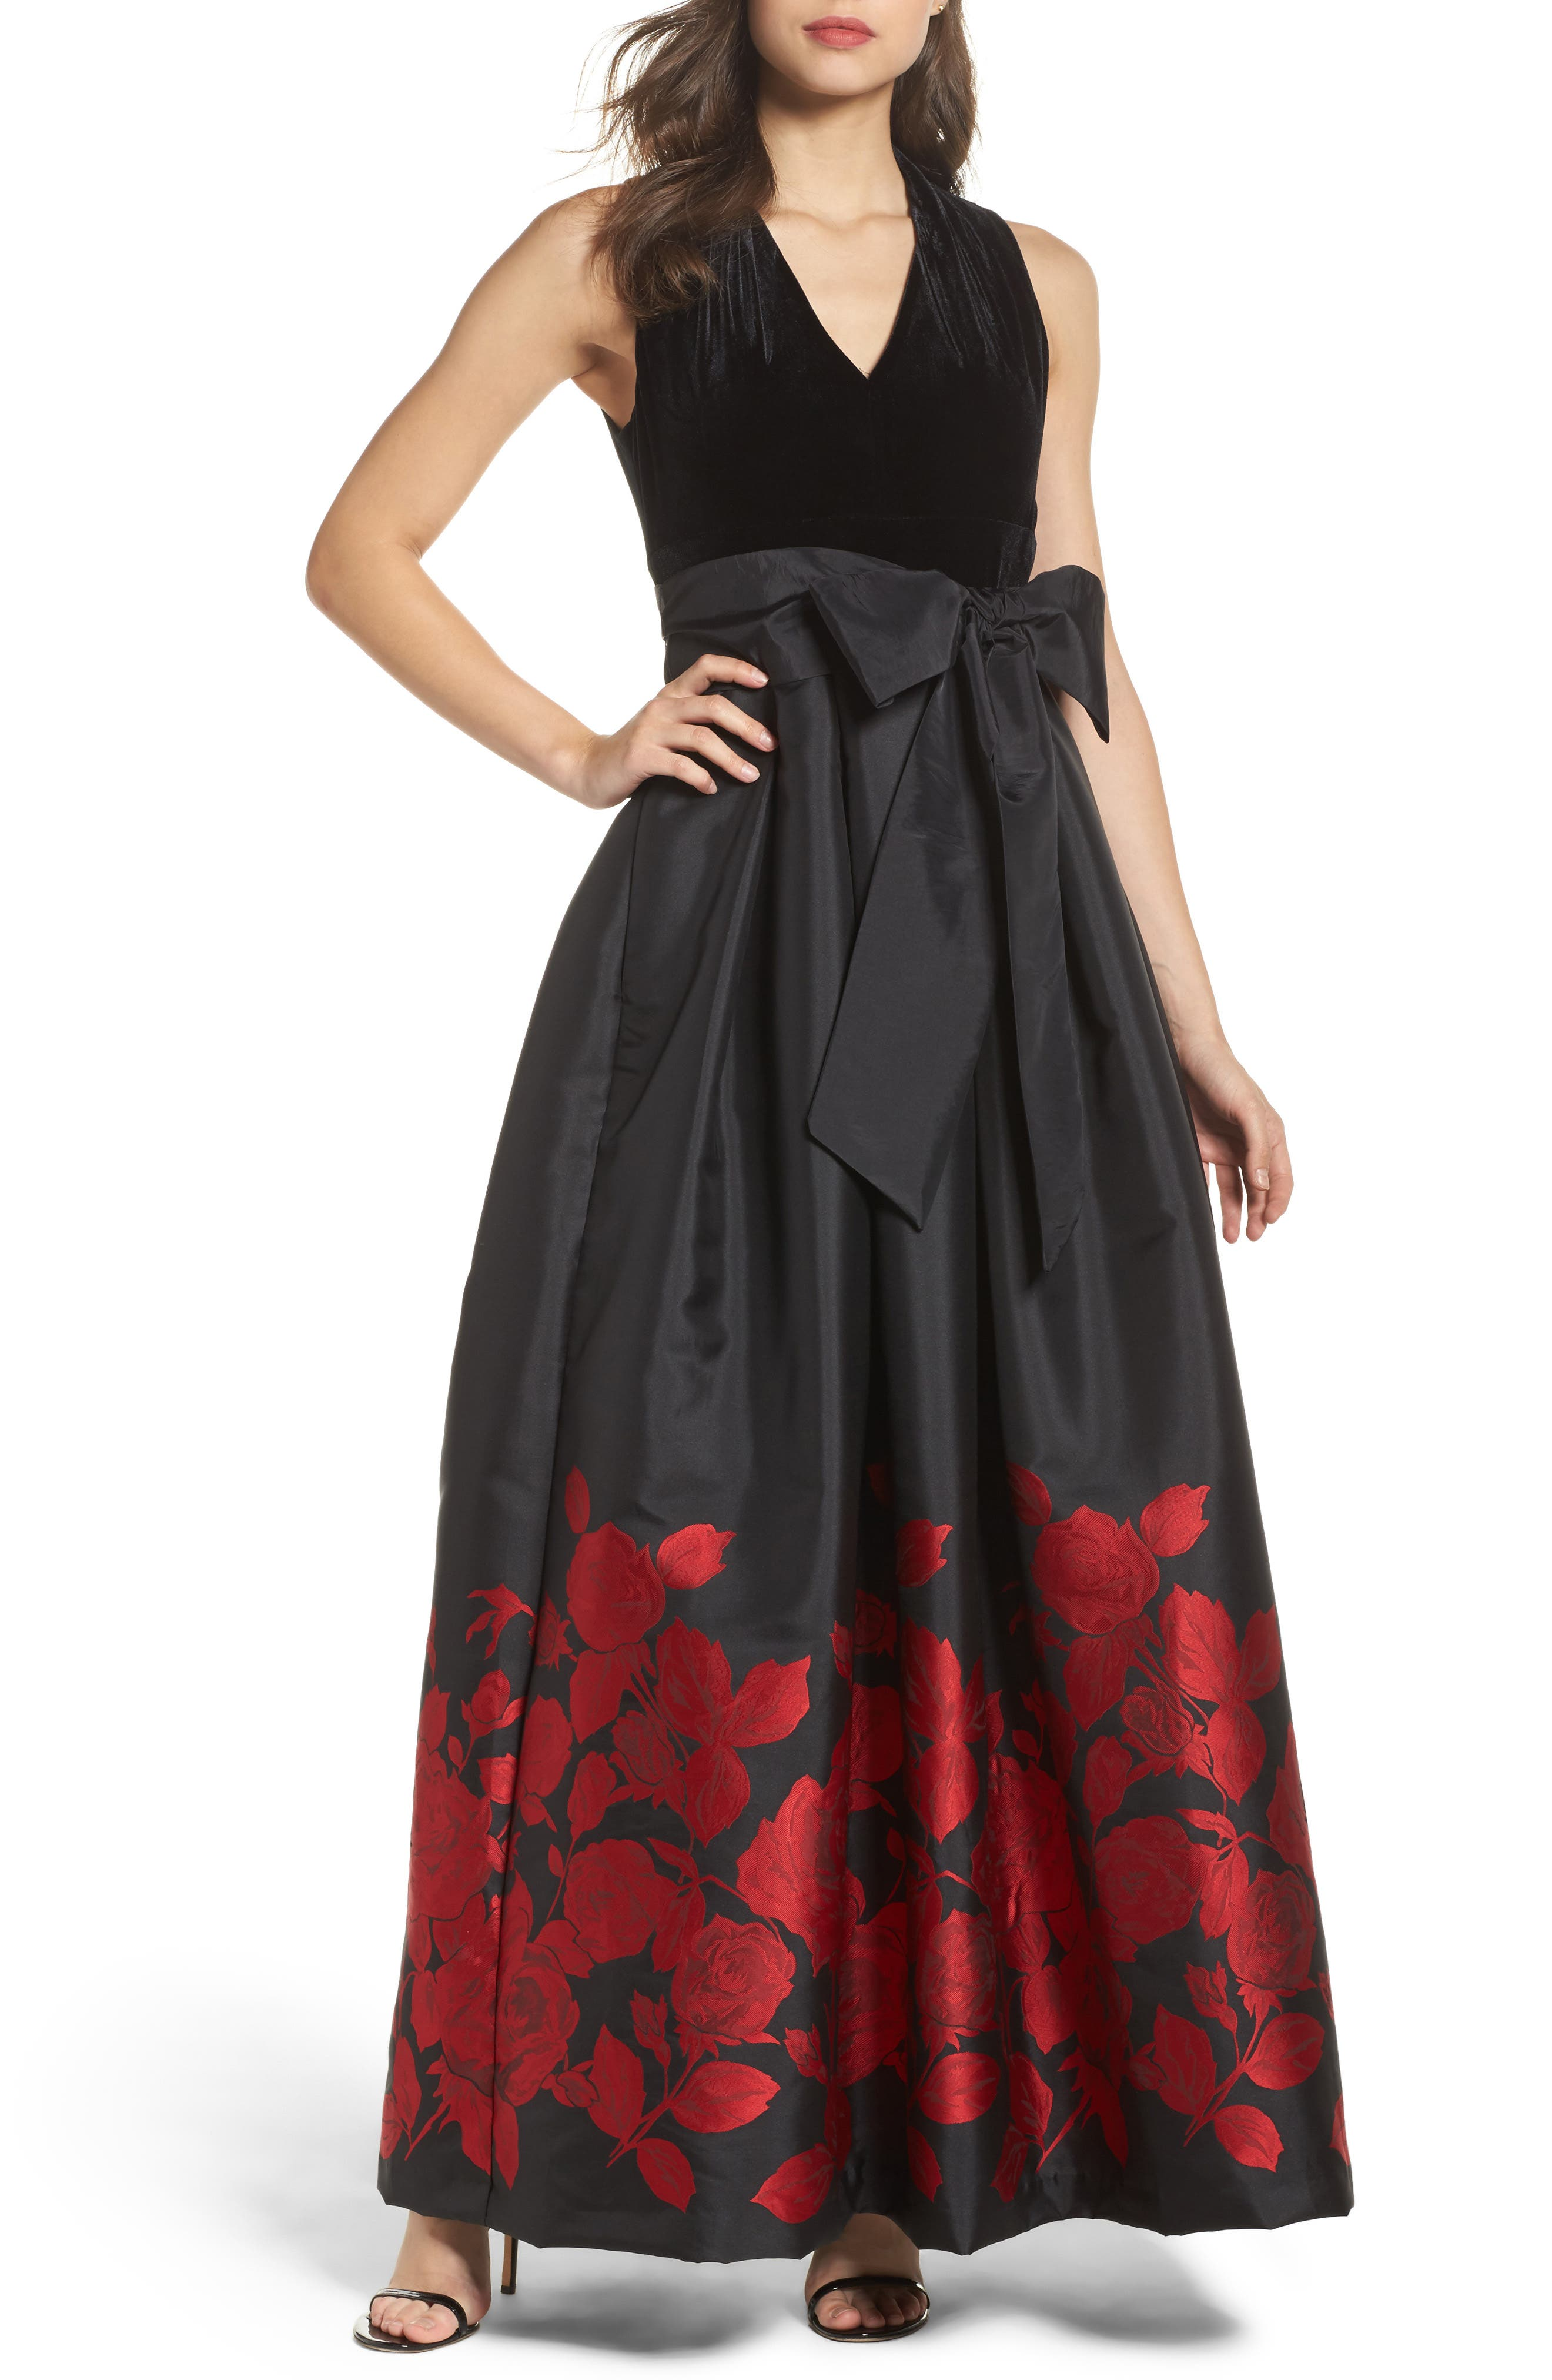 Velvet & Jacquard Ballgown,                             Main thumbnail 1, color,                             Black Red